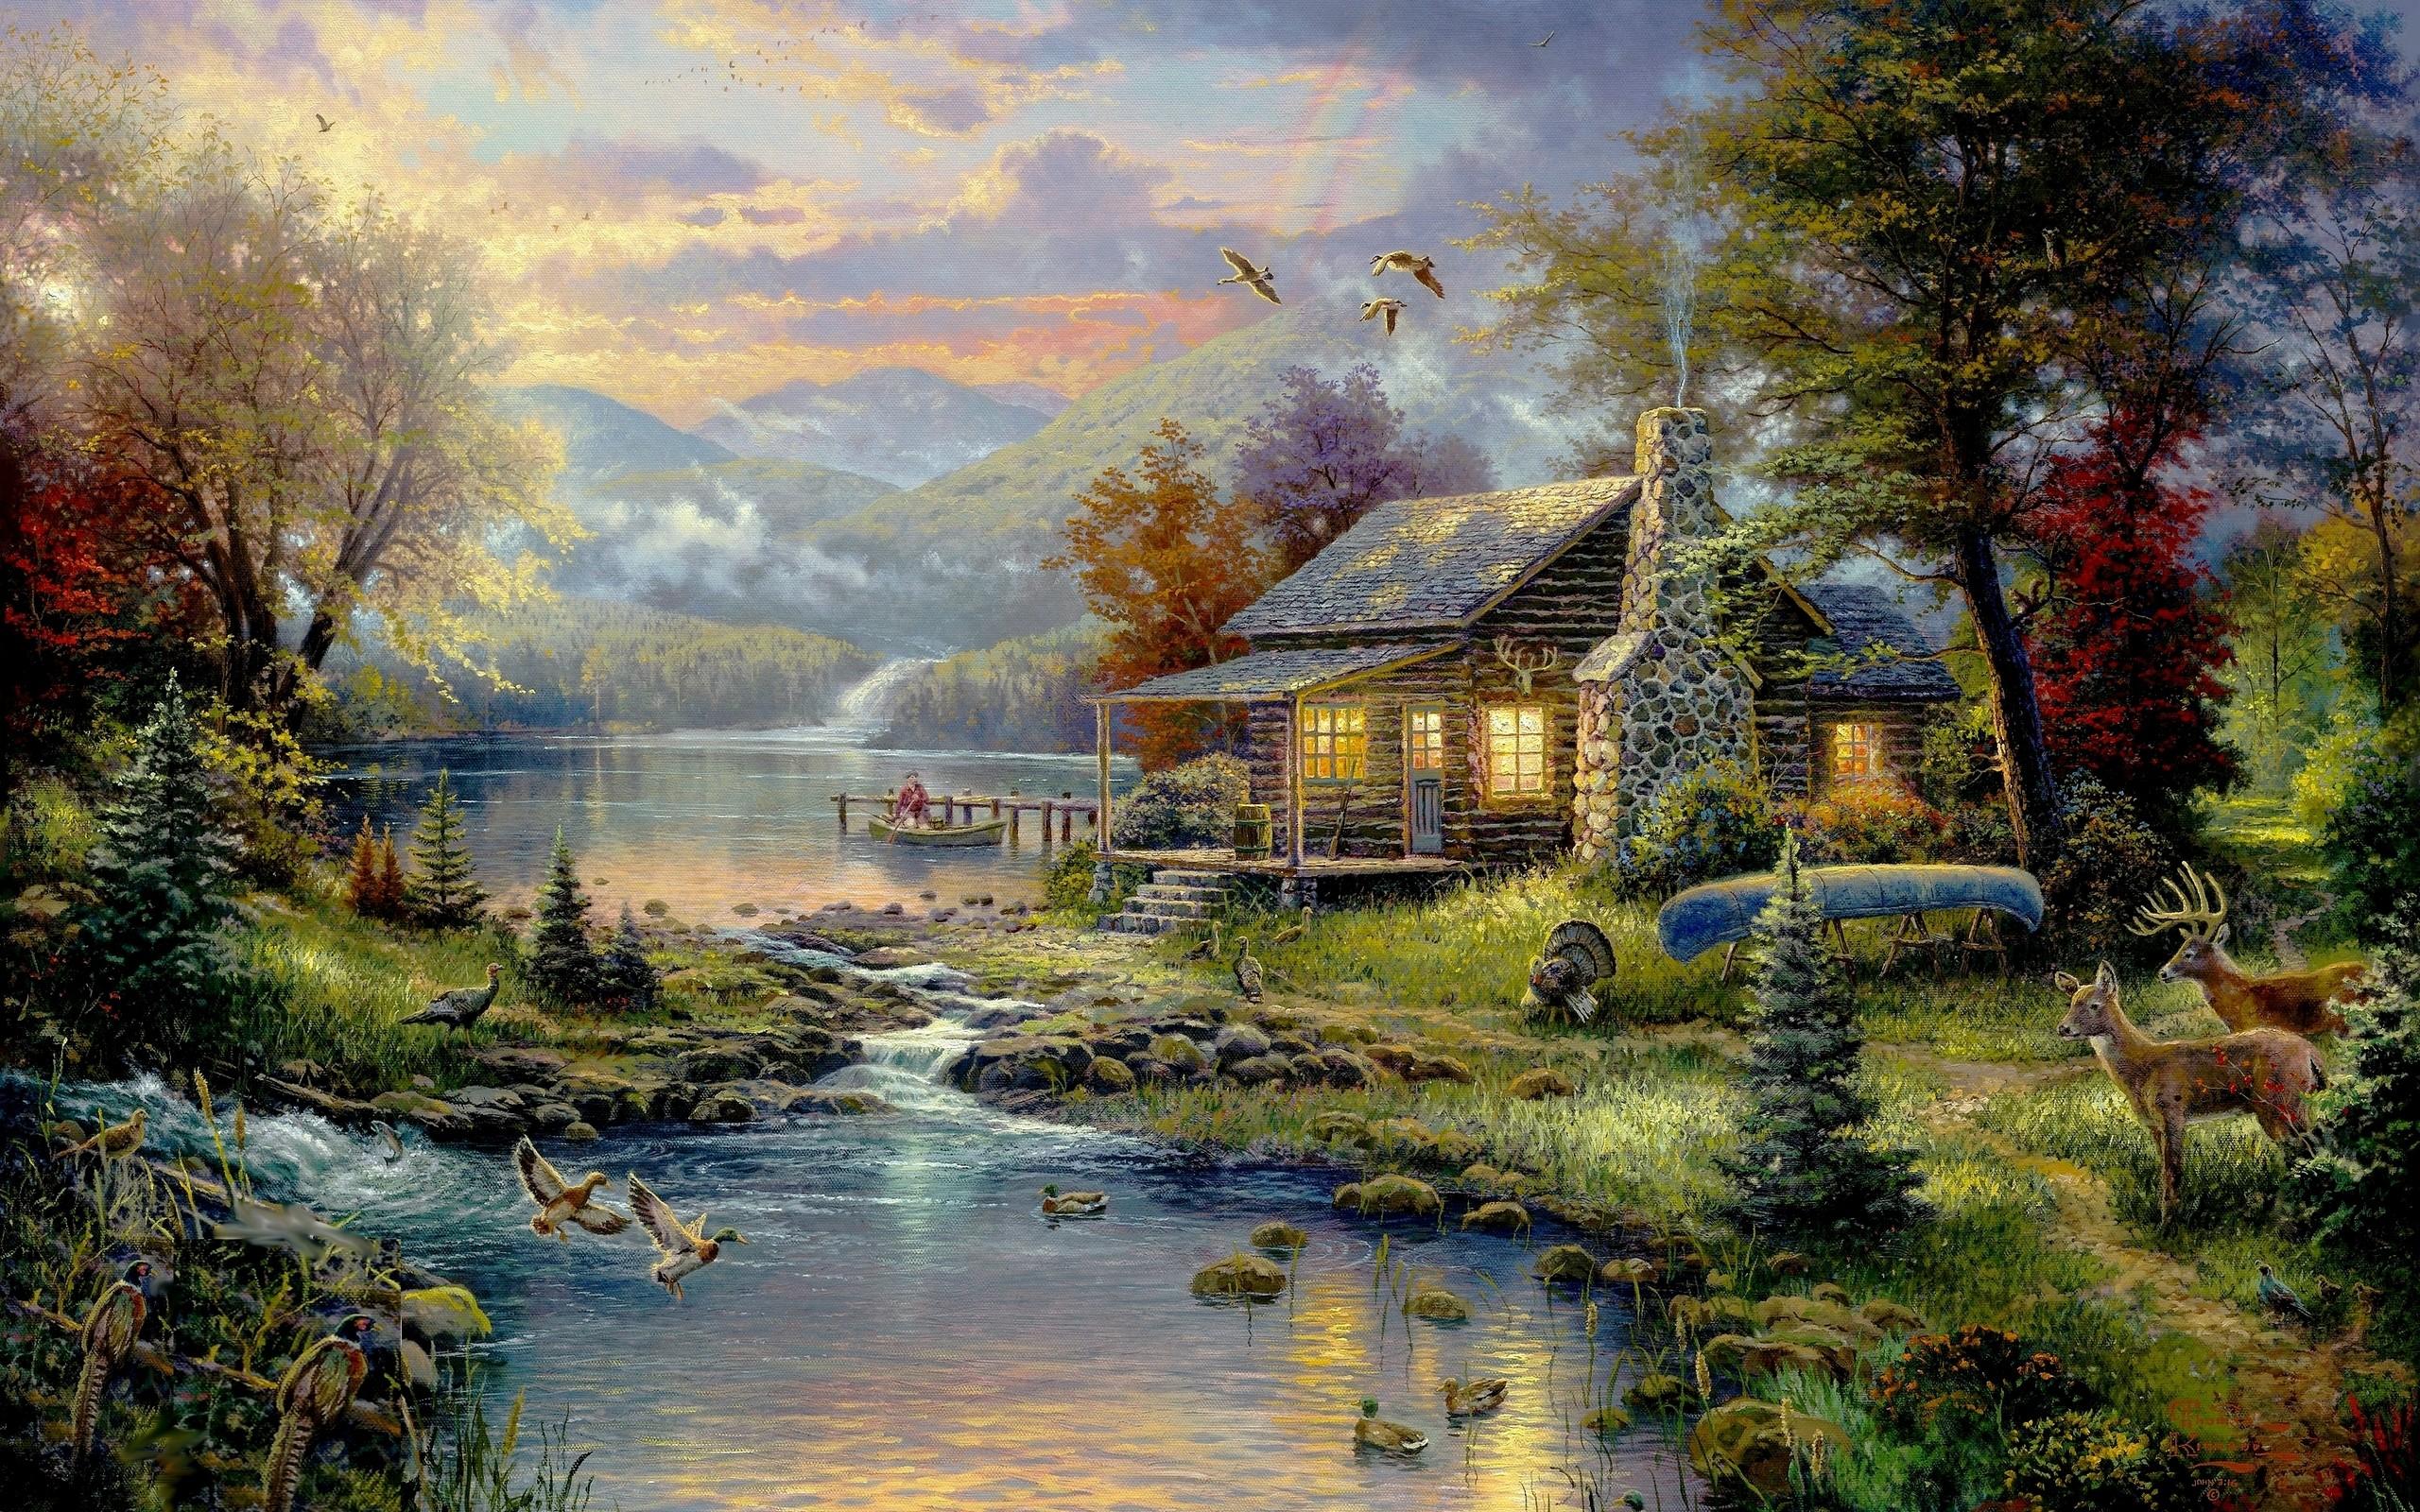 houses rainbows artwork wallpaper 2560x1600 17648 WallpaperUP 2560x1600